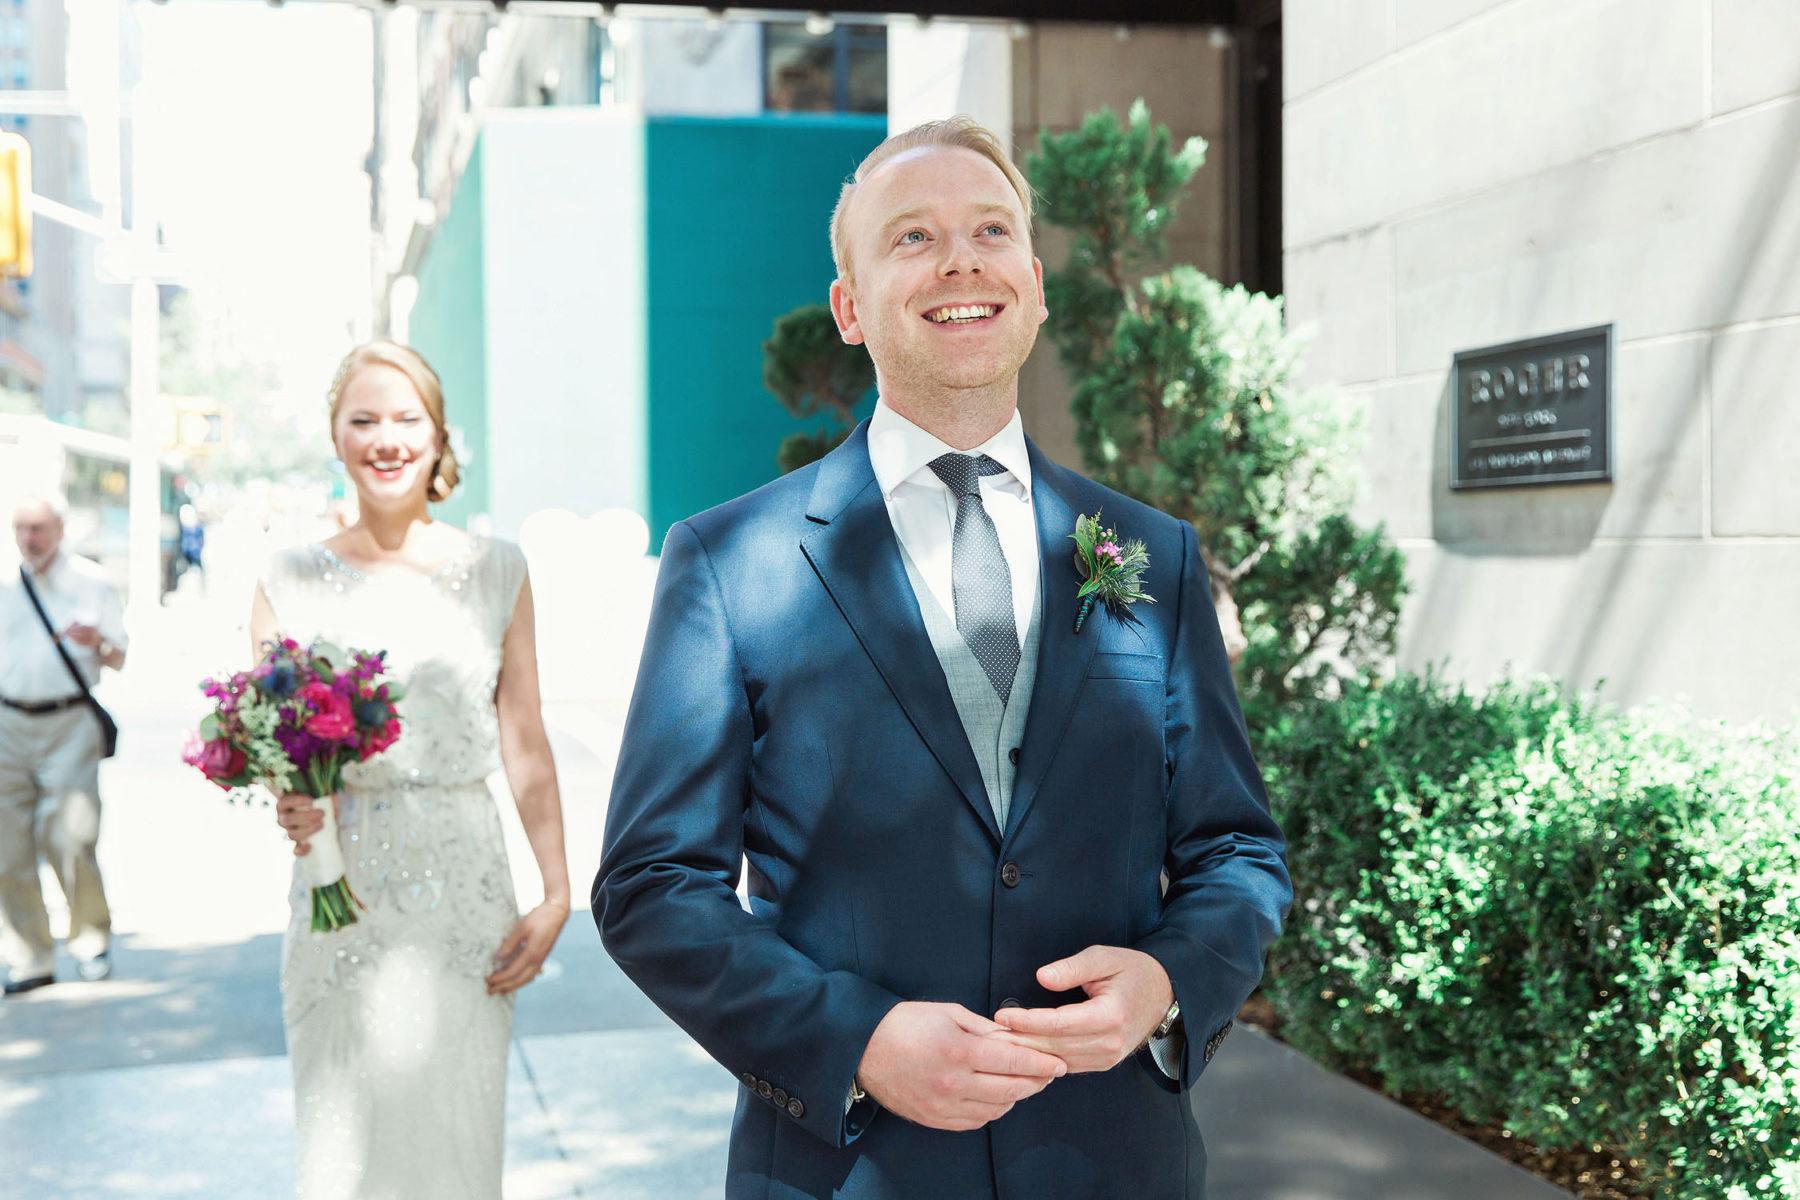 First Look Street Photos - New York City Wedding Photographers